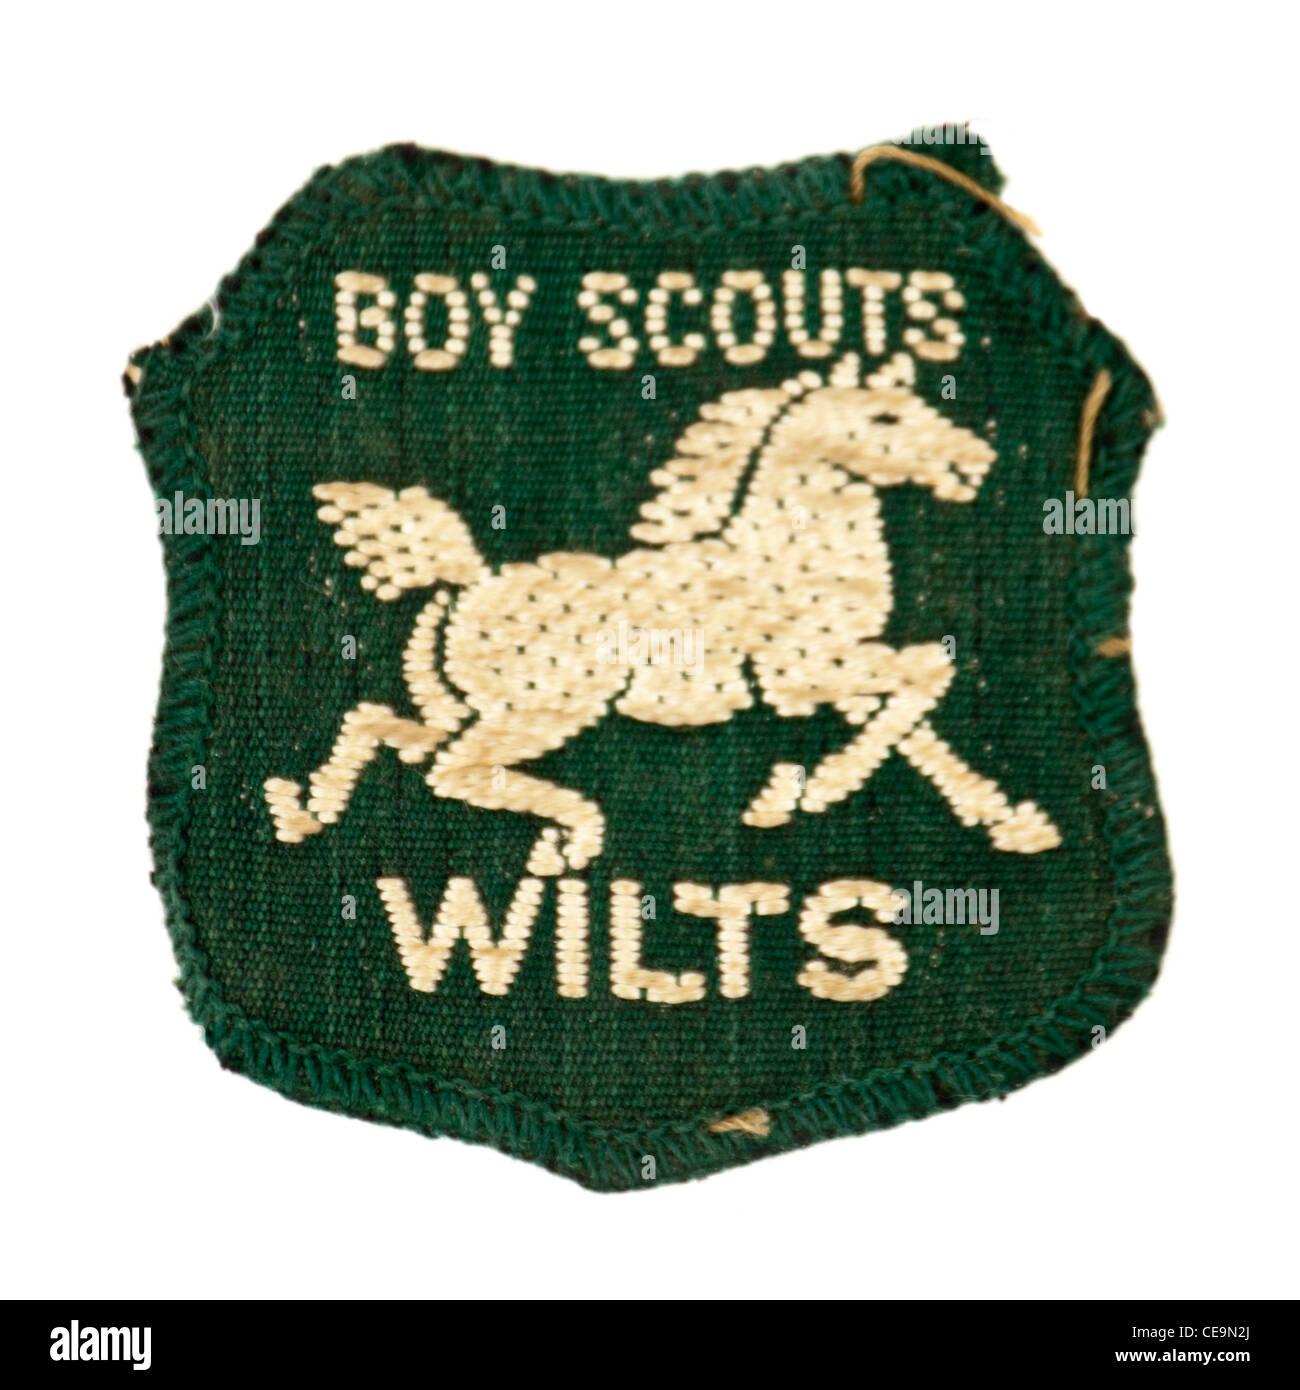 Vintage Boy Scouts uniform patch (Wiltshire, England) - Stock Image